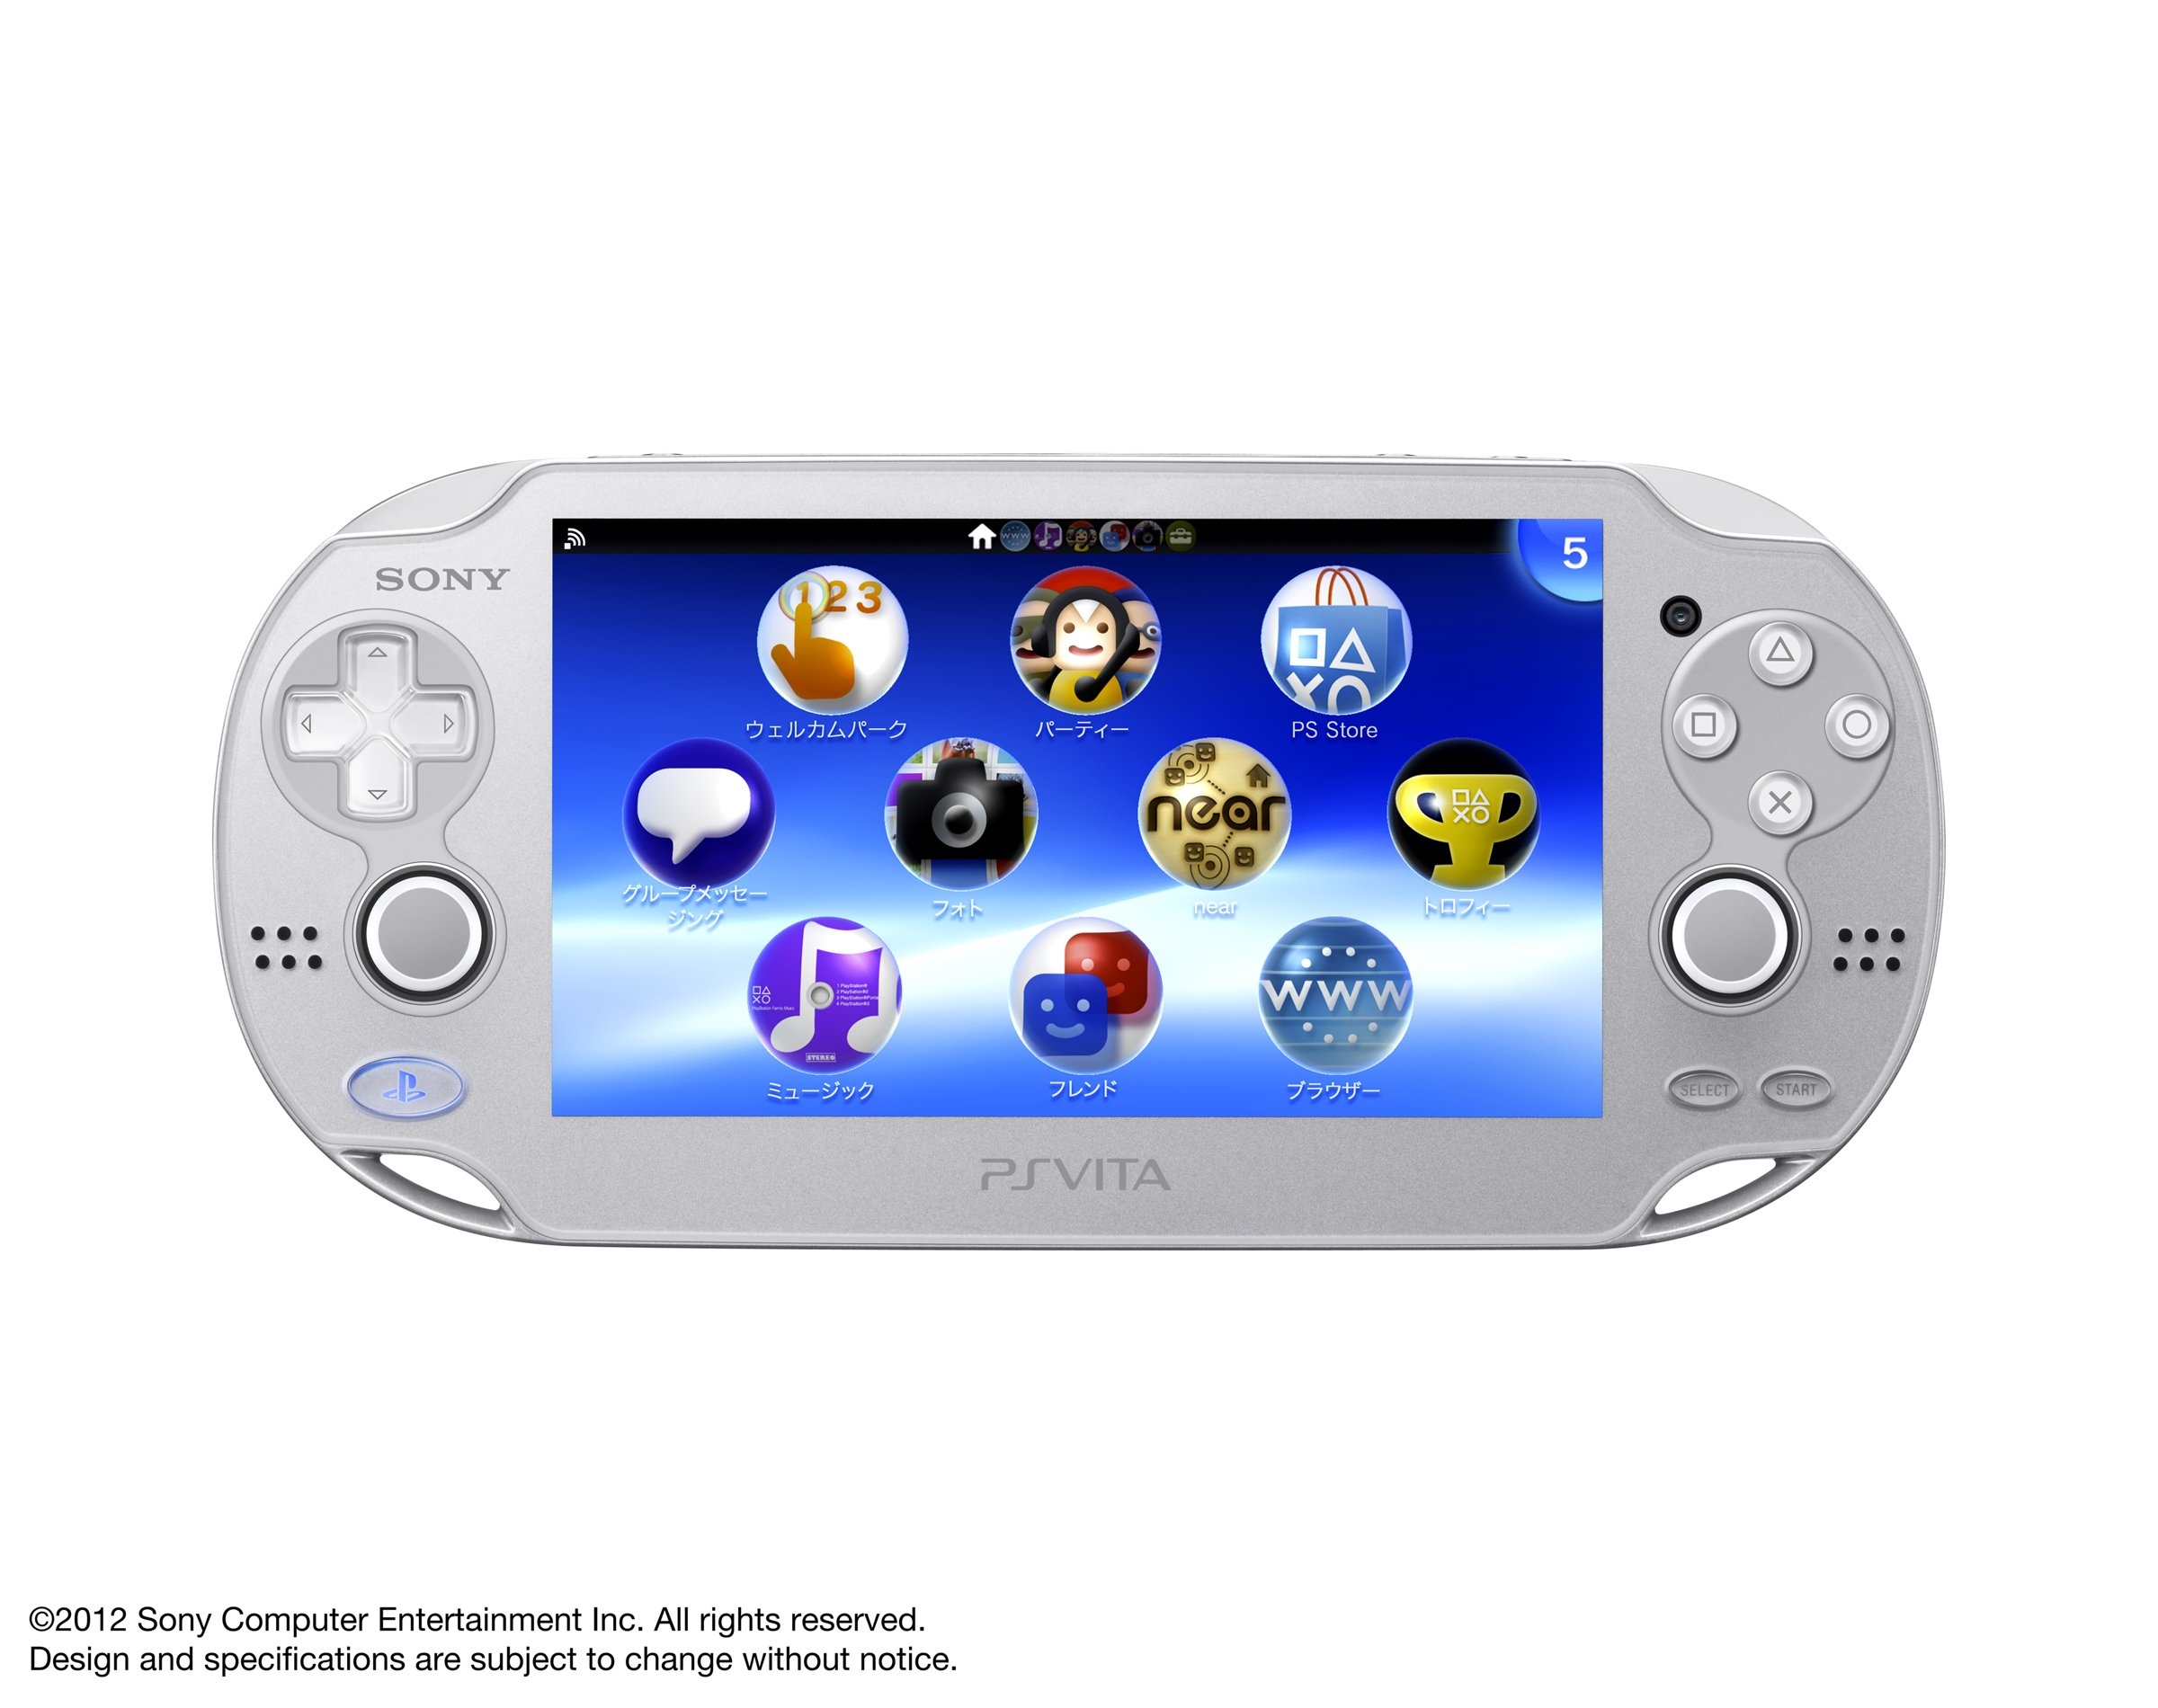 PlayStation Vita - WiFi Ice Silver - Japanese Version (only plays Japanese version PlayStation Vita games)